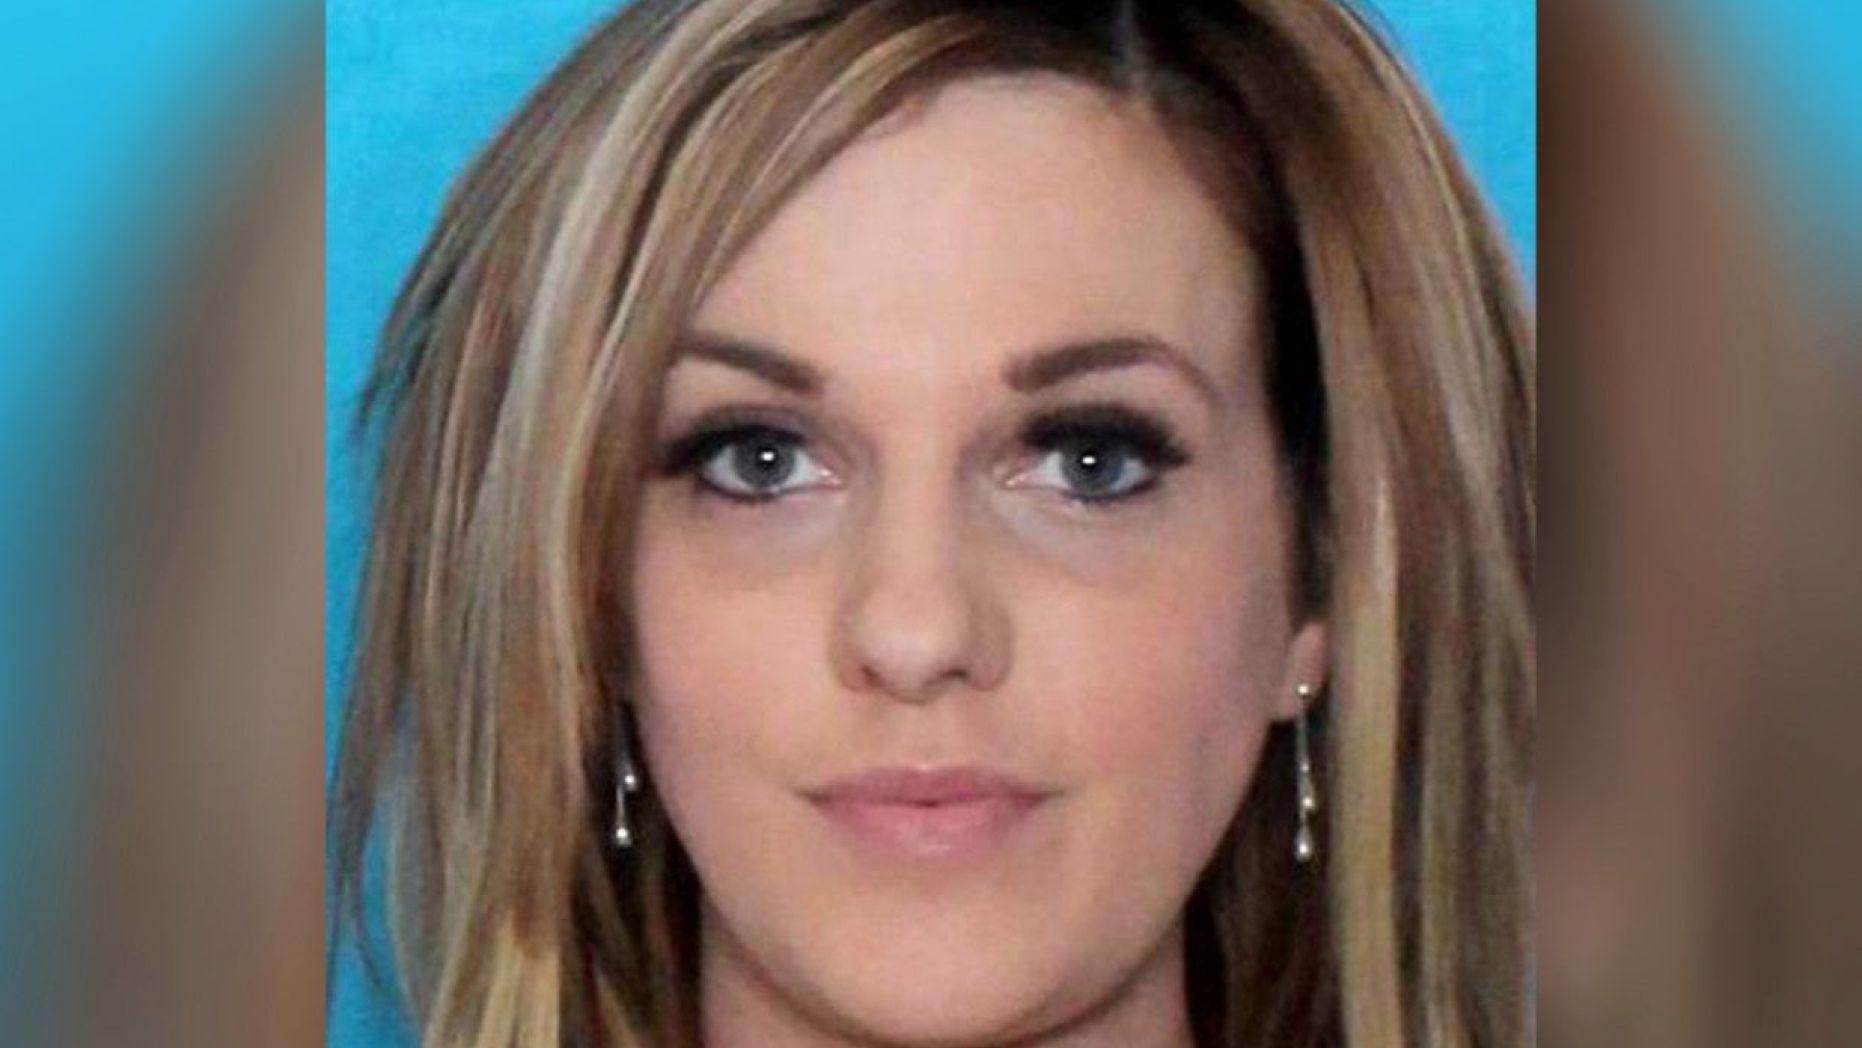 Maegan Adkins-Barras, 32,